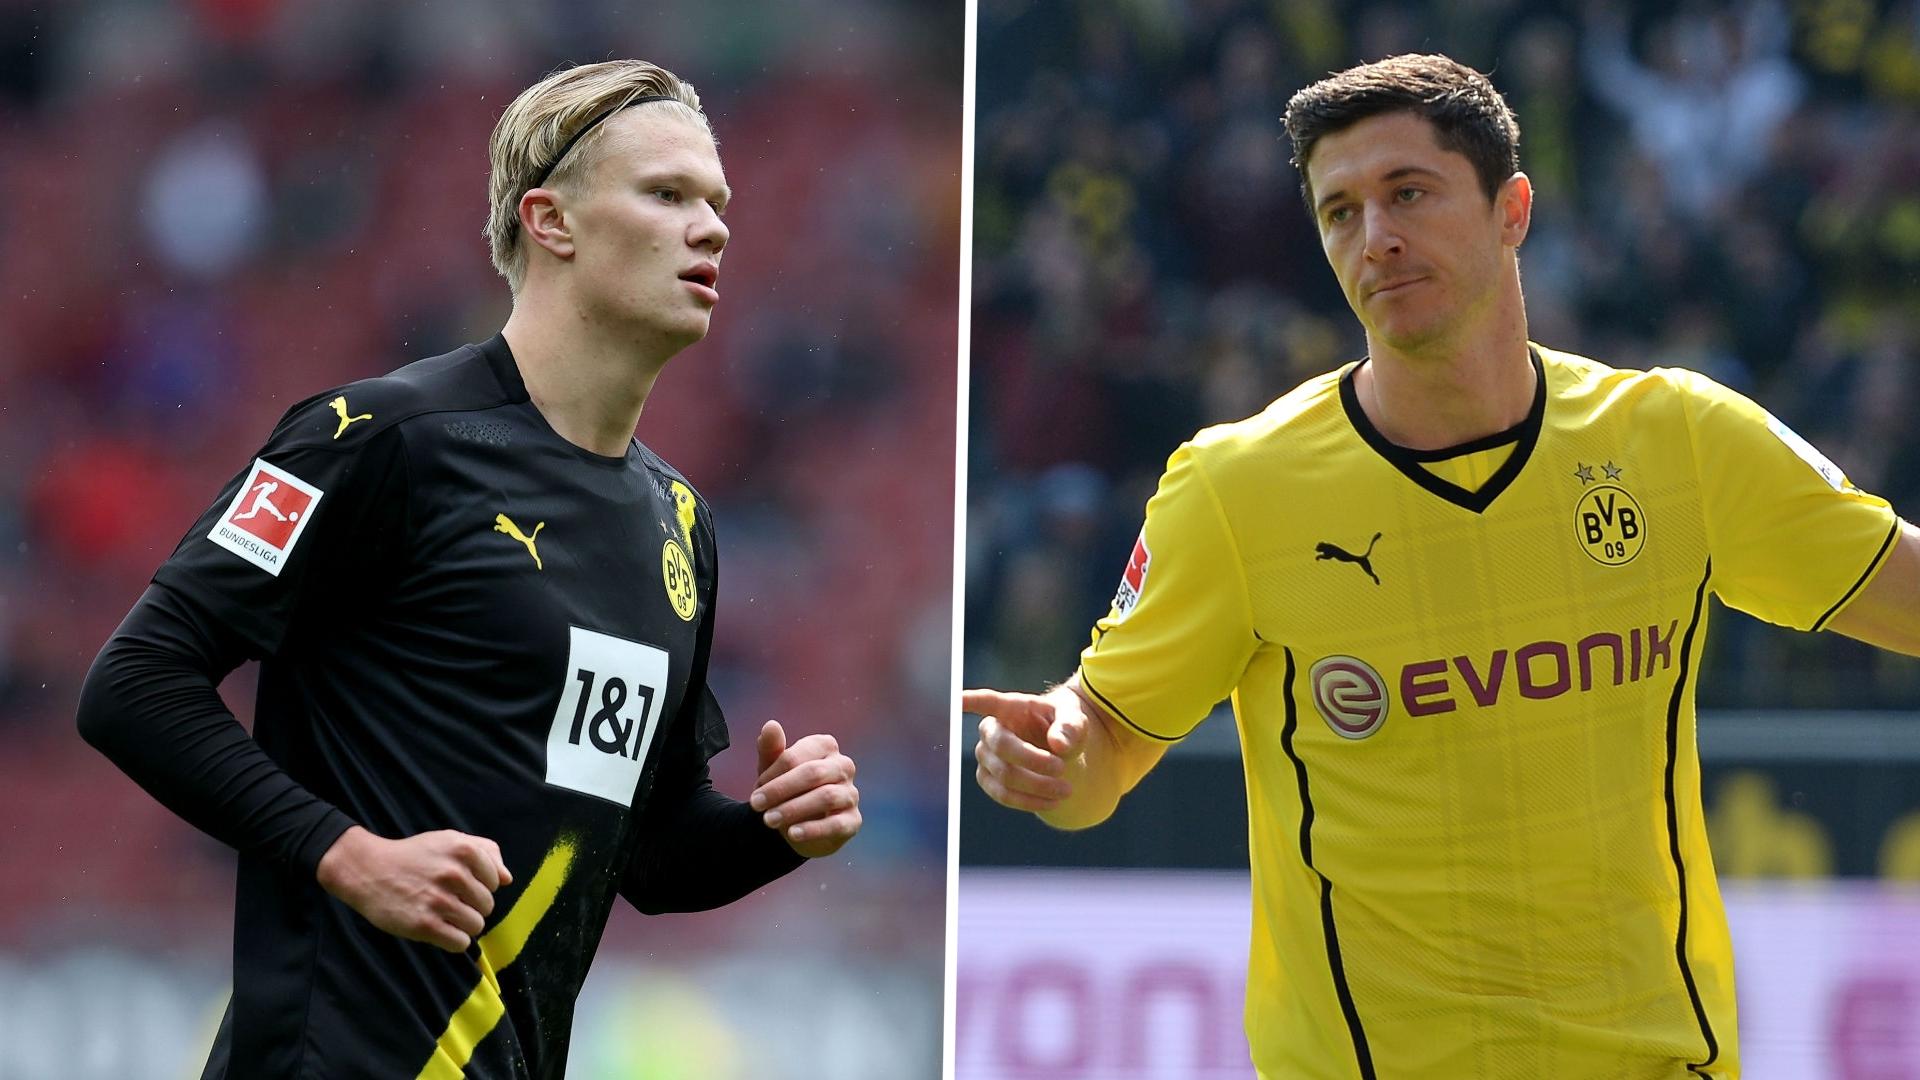 Bigger expectations on Haaland than there were on Lewandowski at Dortmund, claims ex-BVB captain Kehl